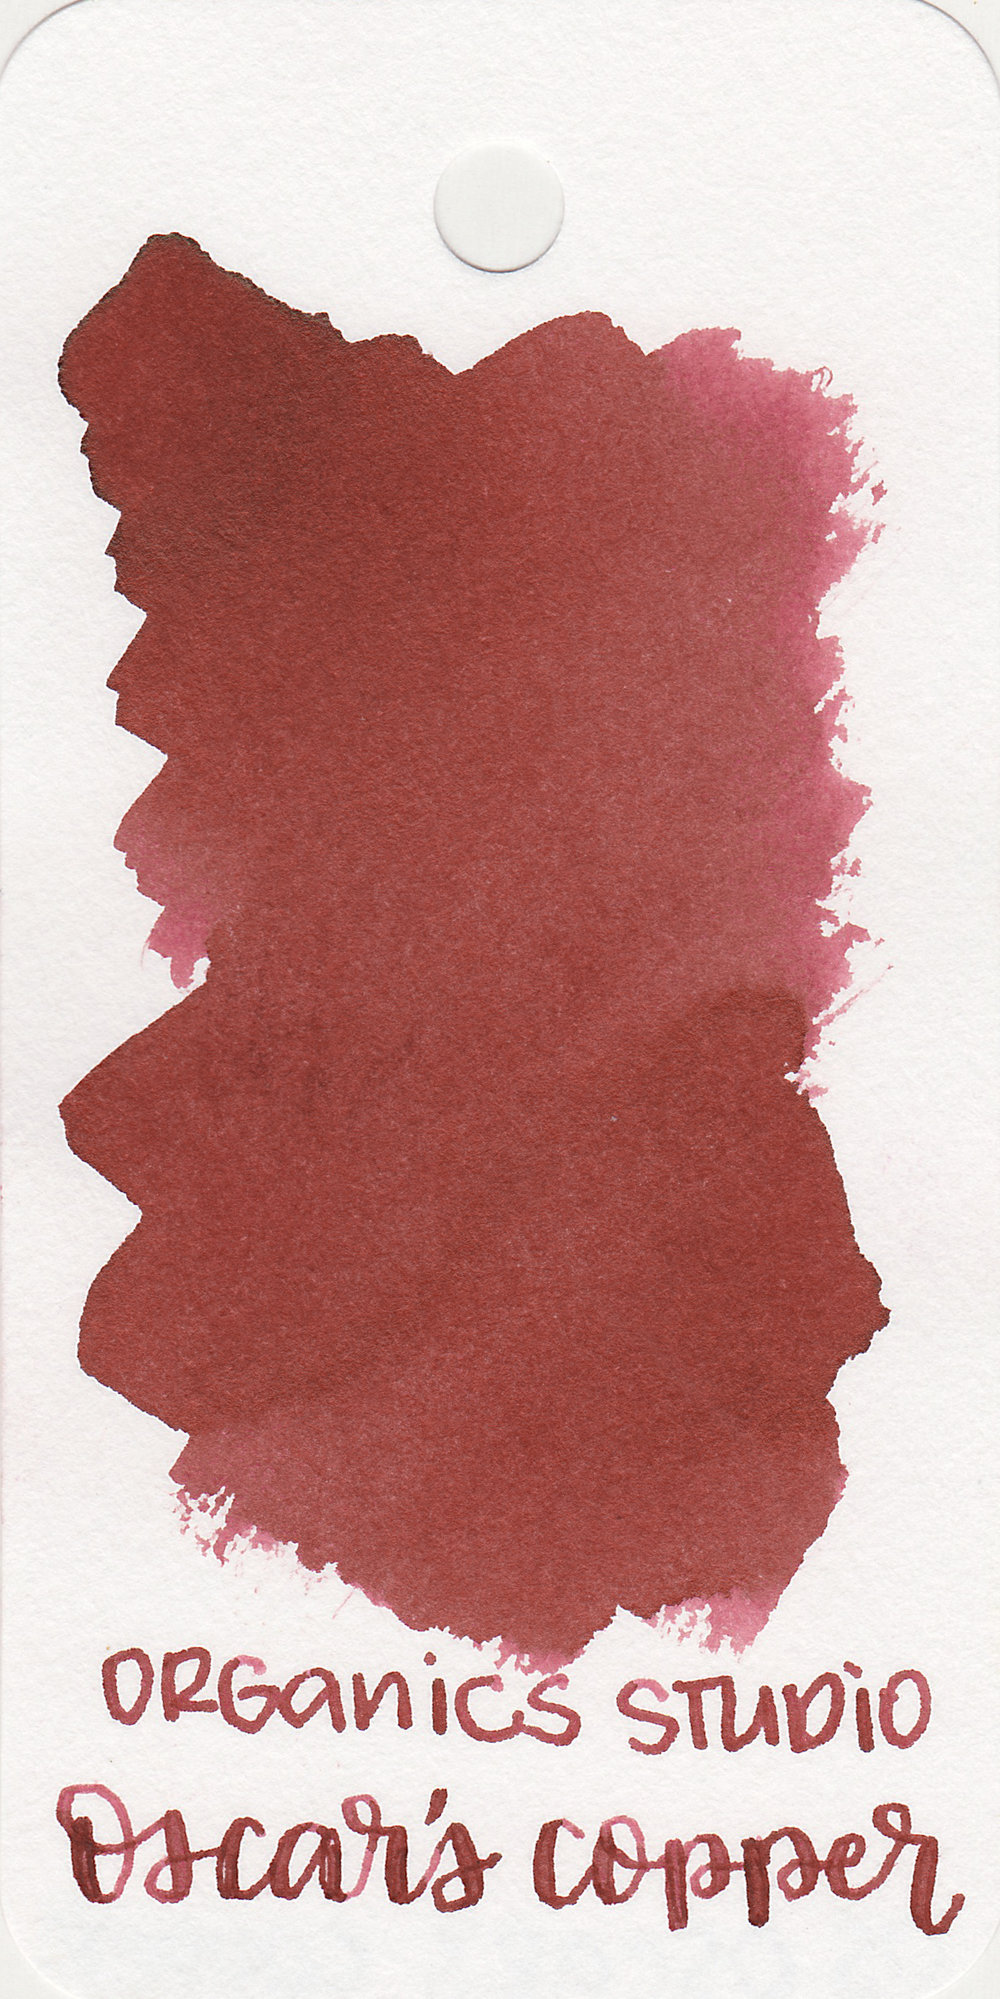 os-oscars-copper-1.jpg